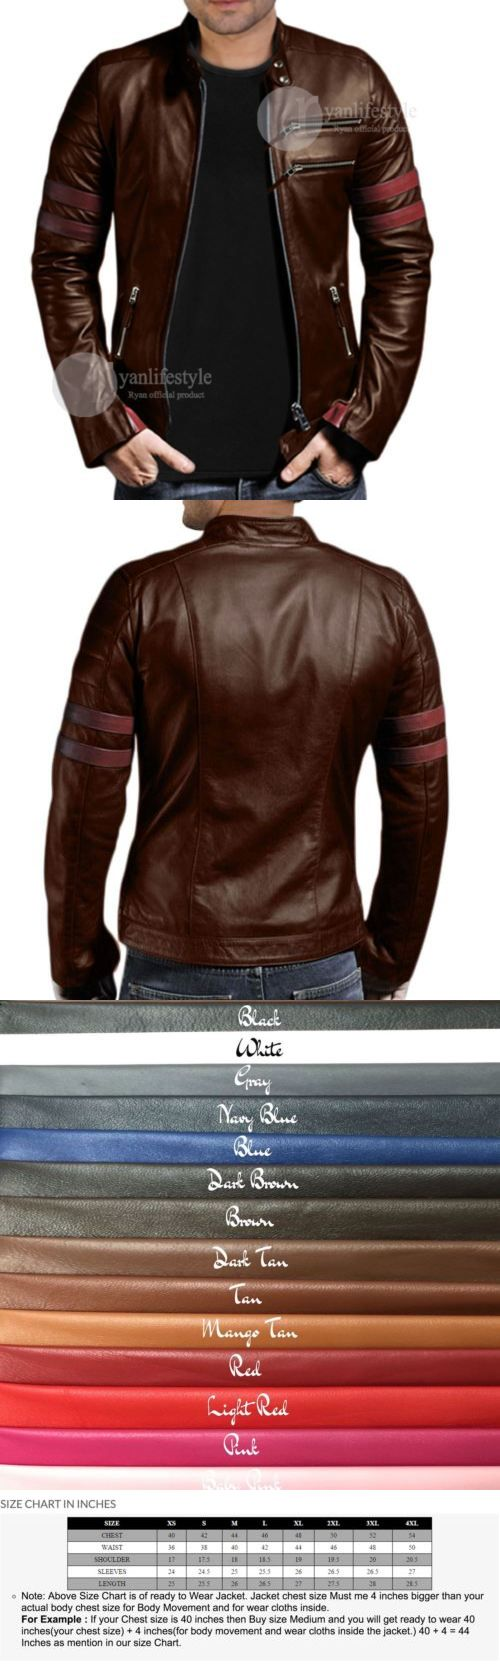 Men Coats And Jackets: Leather Jacket Mens Motorcycle Biker New Lambskin Coat Slim Men Jacket 960 -> BUY IT NOW ONLY: $119 on eBay!